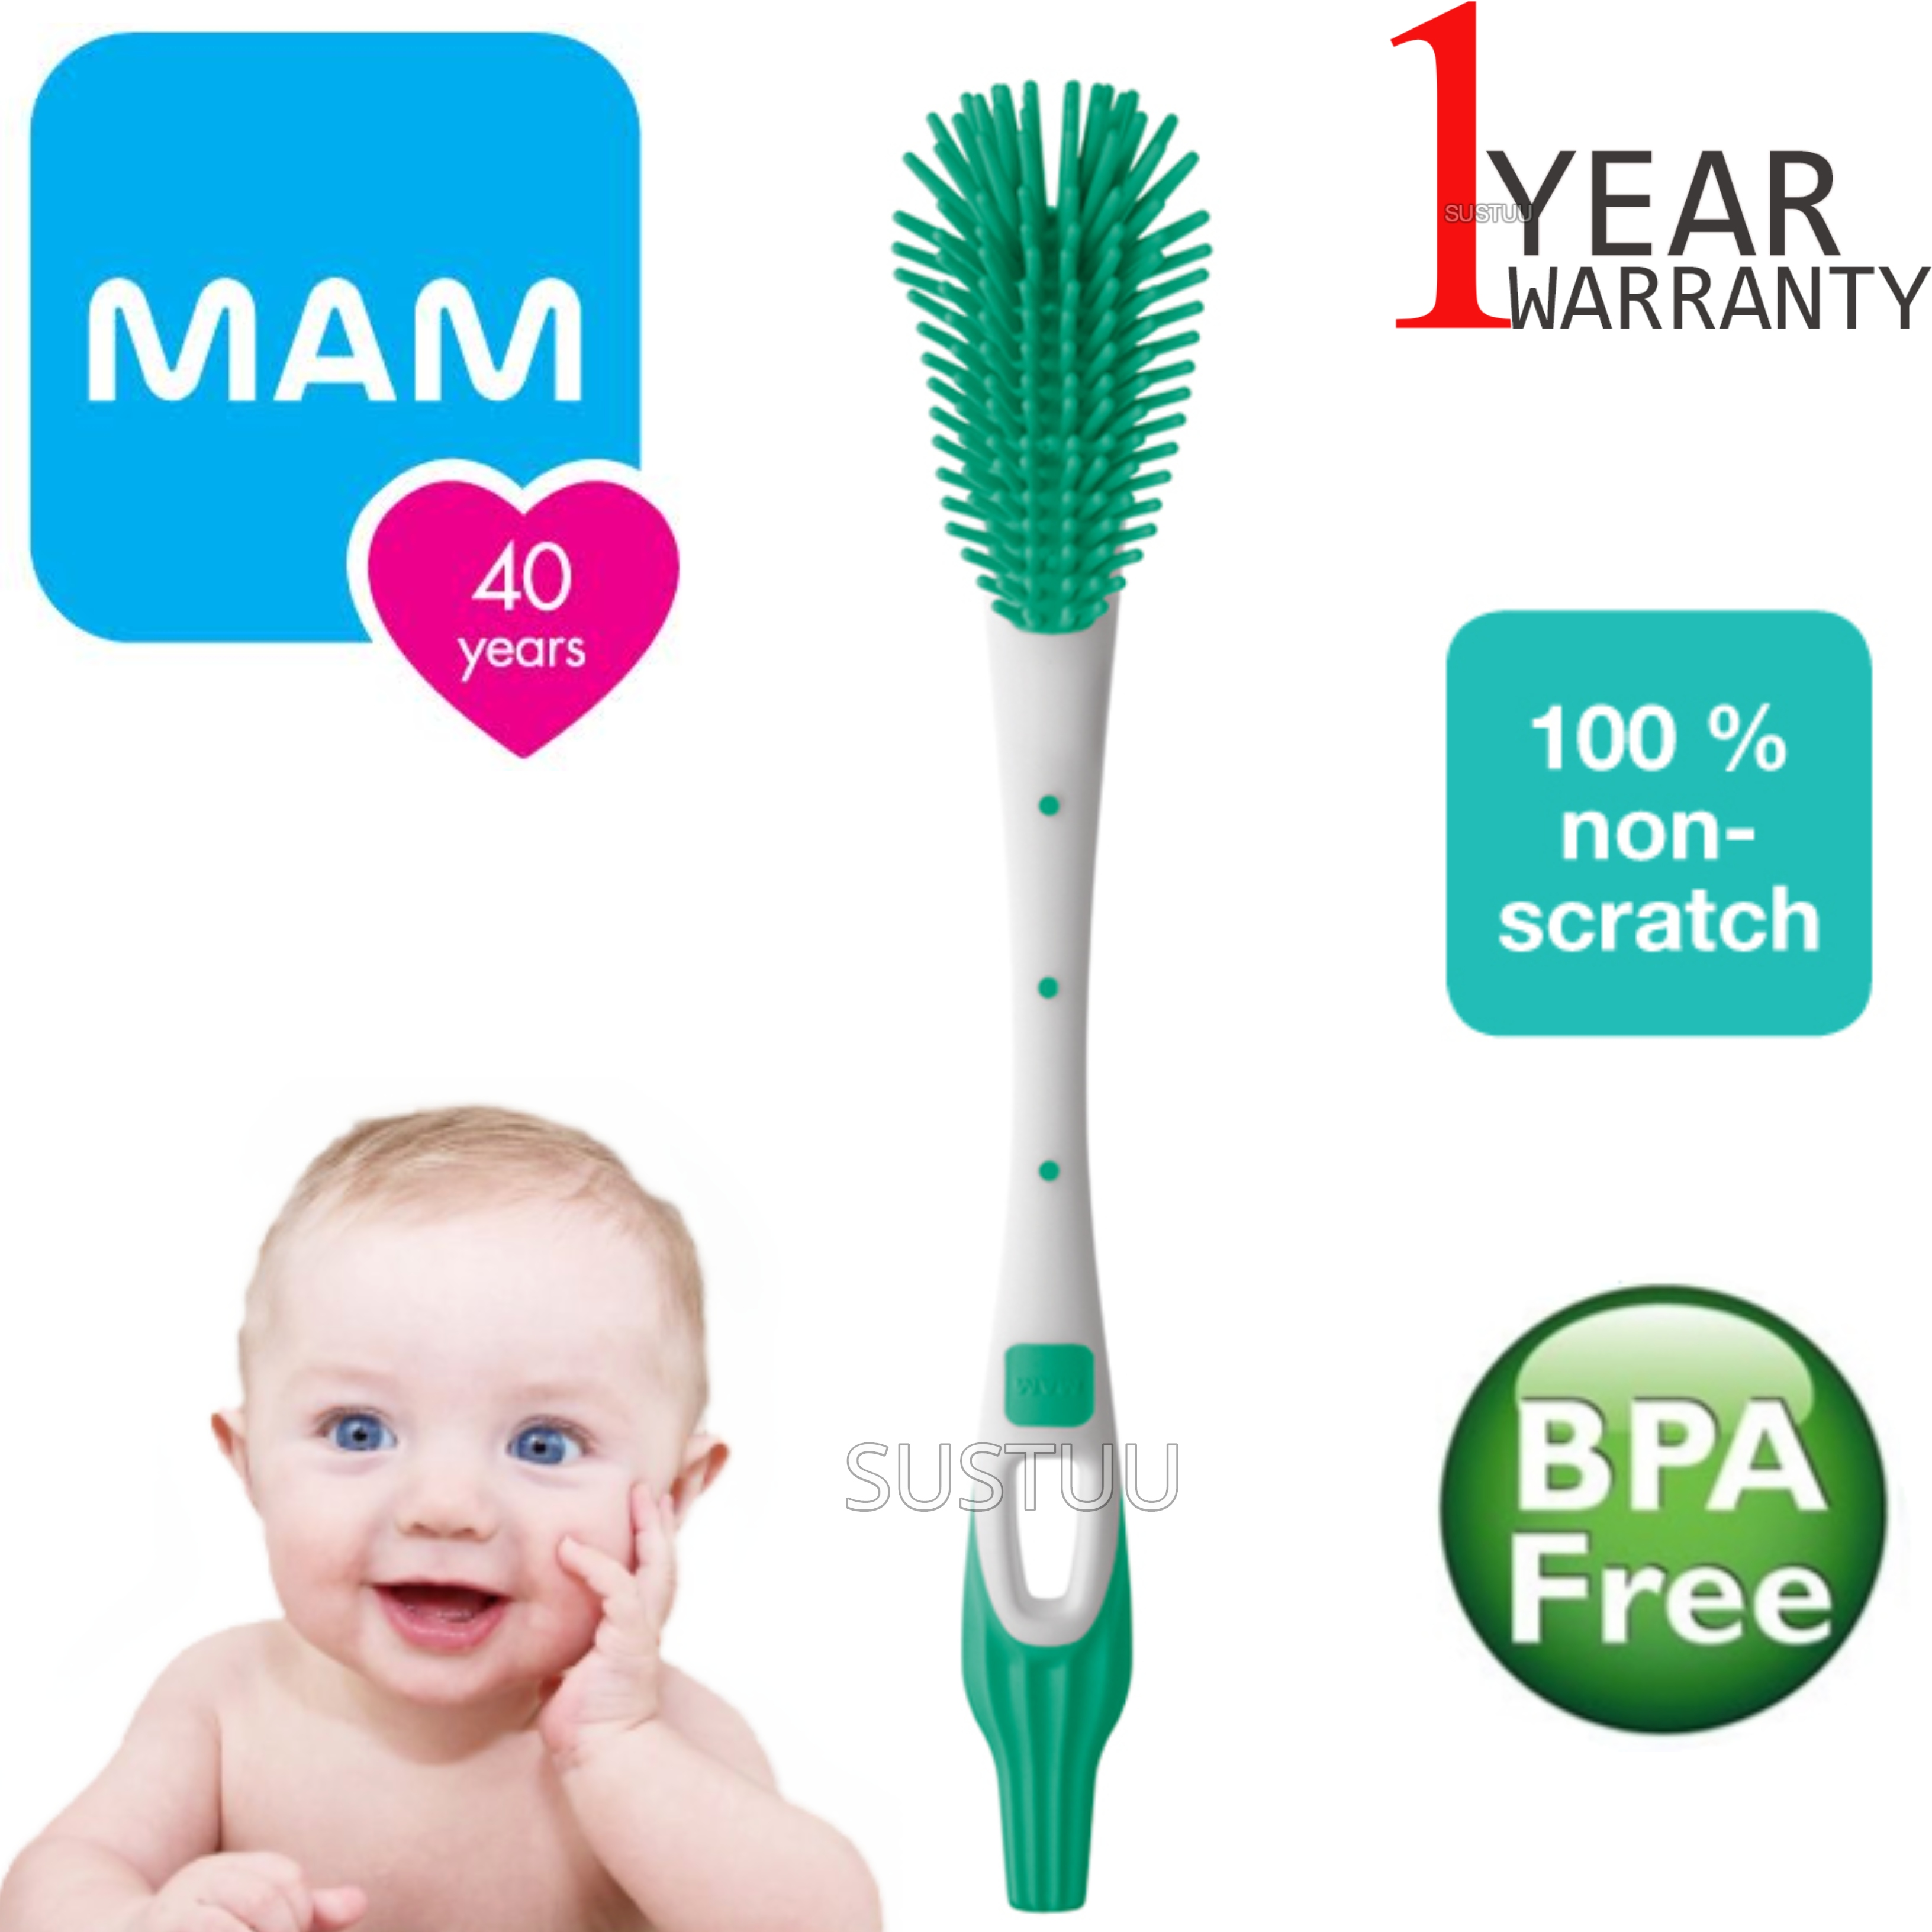 MAM Soft Bottle Brush with 100/% Non-Scratch Bristles